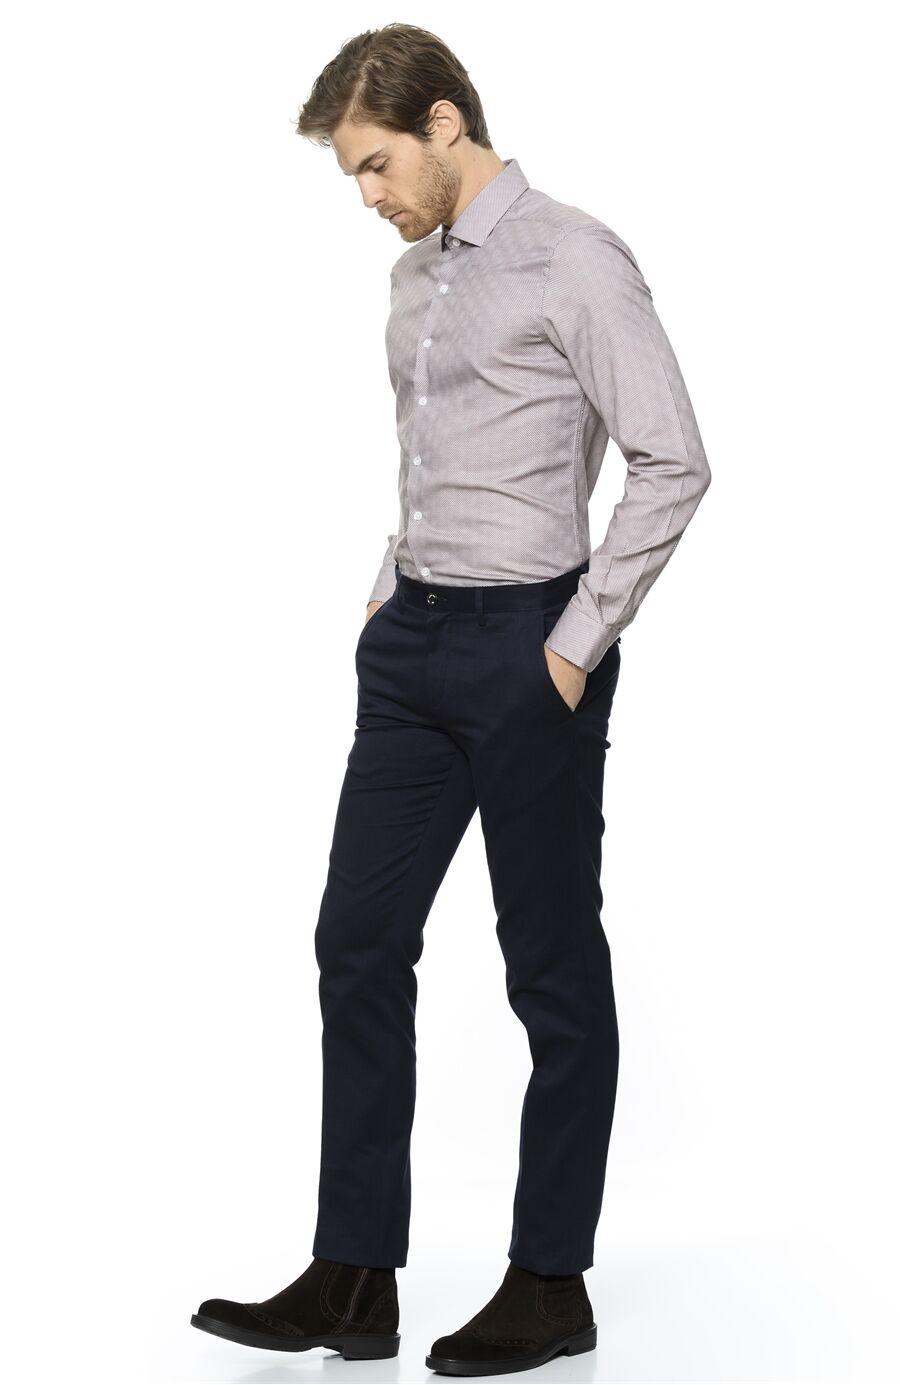 Baskılı Rahat Kesim Lacivert-Kahverengi Gömlek